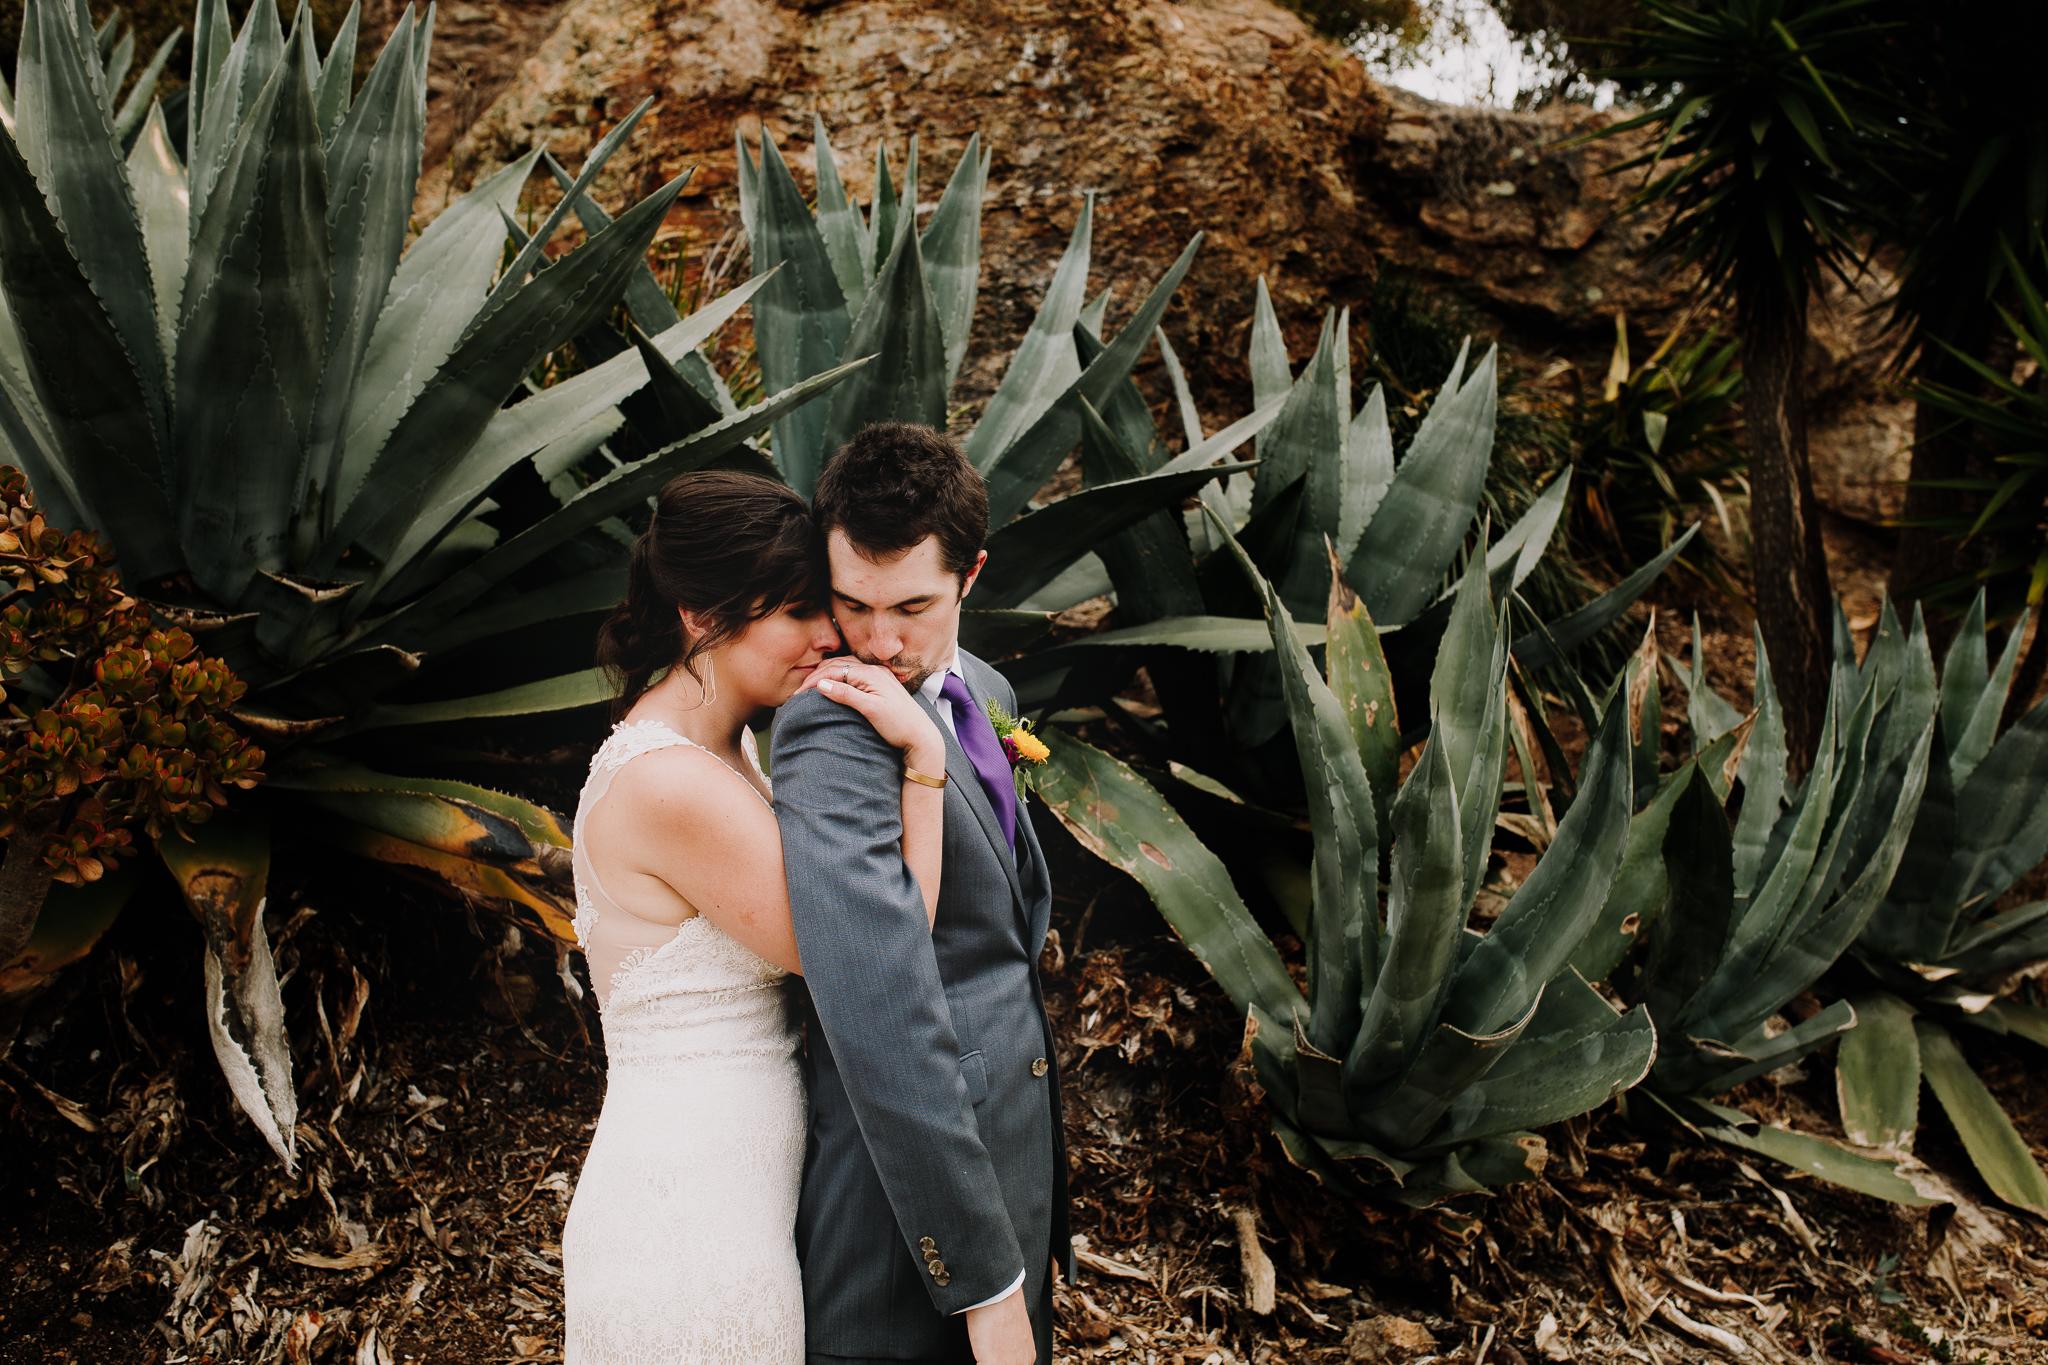 Archer Inspired Photography San Francisco Bay Area Wedding Lifestyle Documentary City Bar Photographer-26.jpg